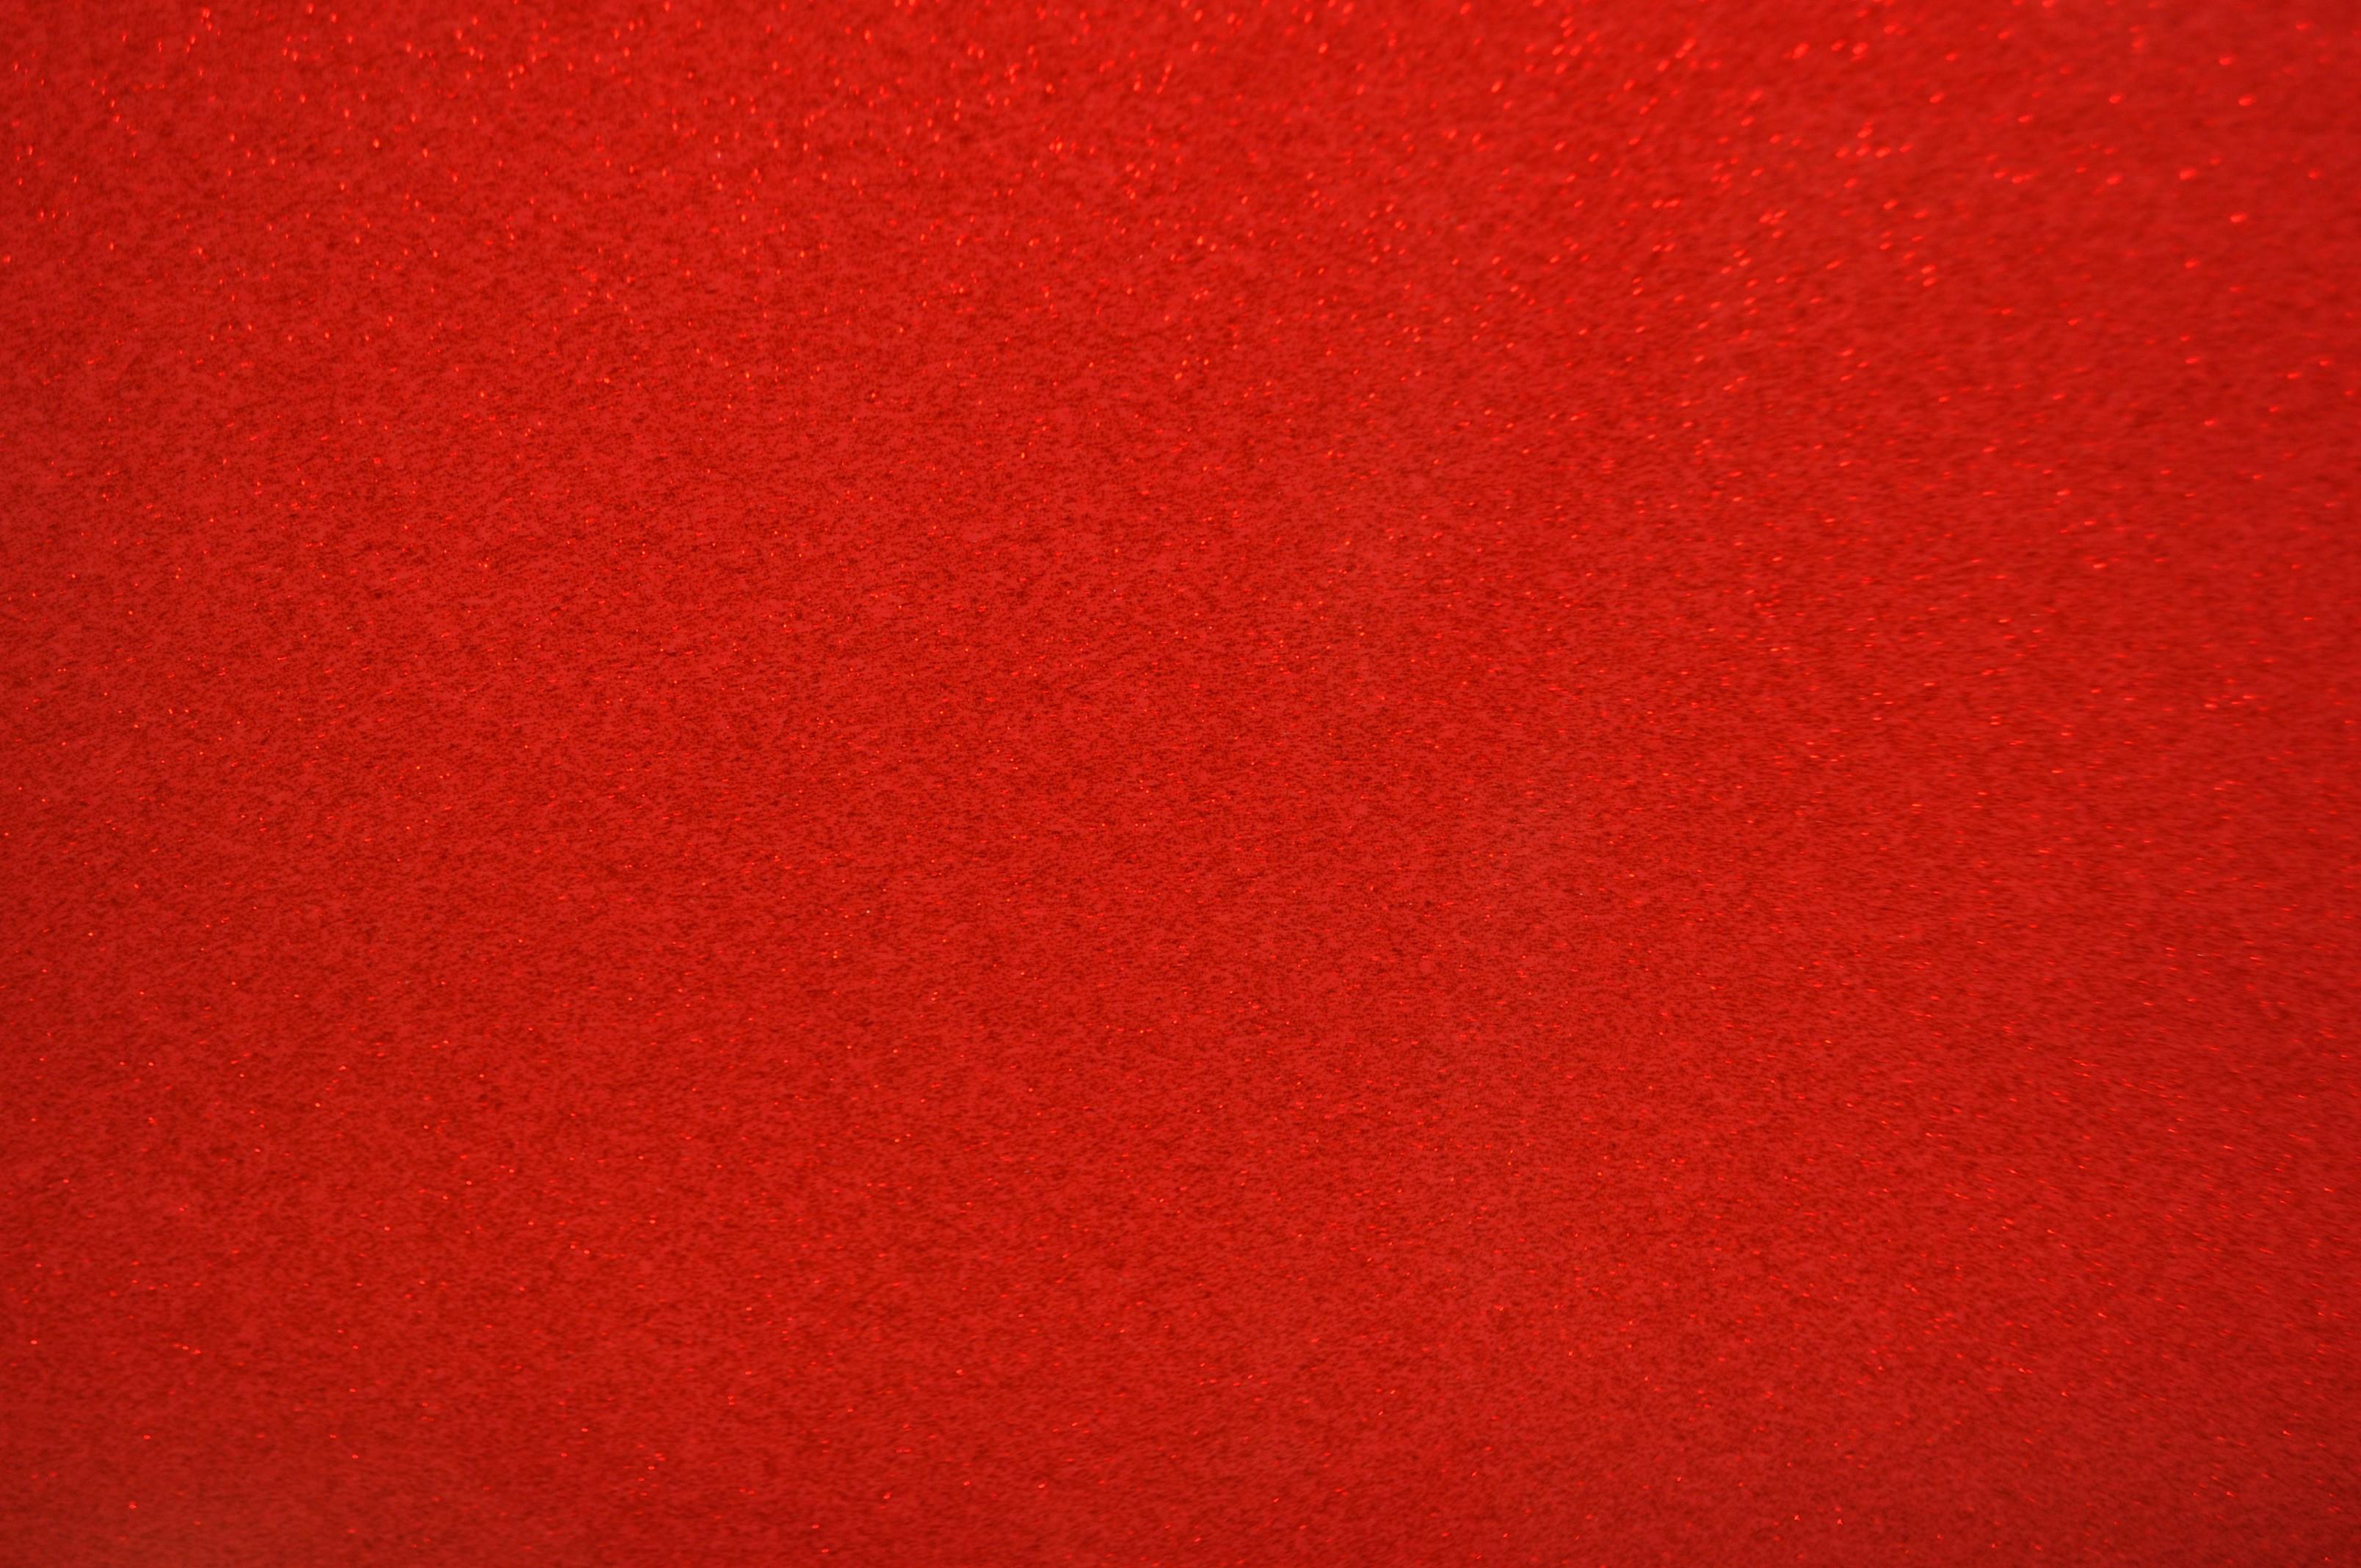 Sparkle Vinyl Fabric  Sparkle Vinyl Upholstery Fabric